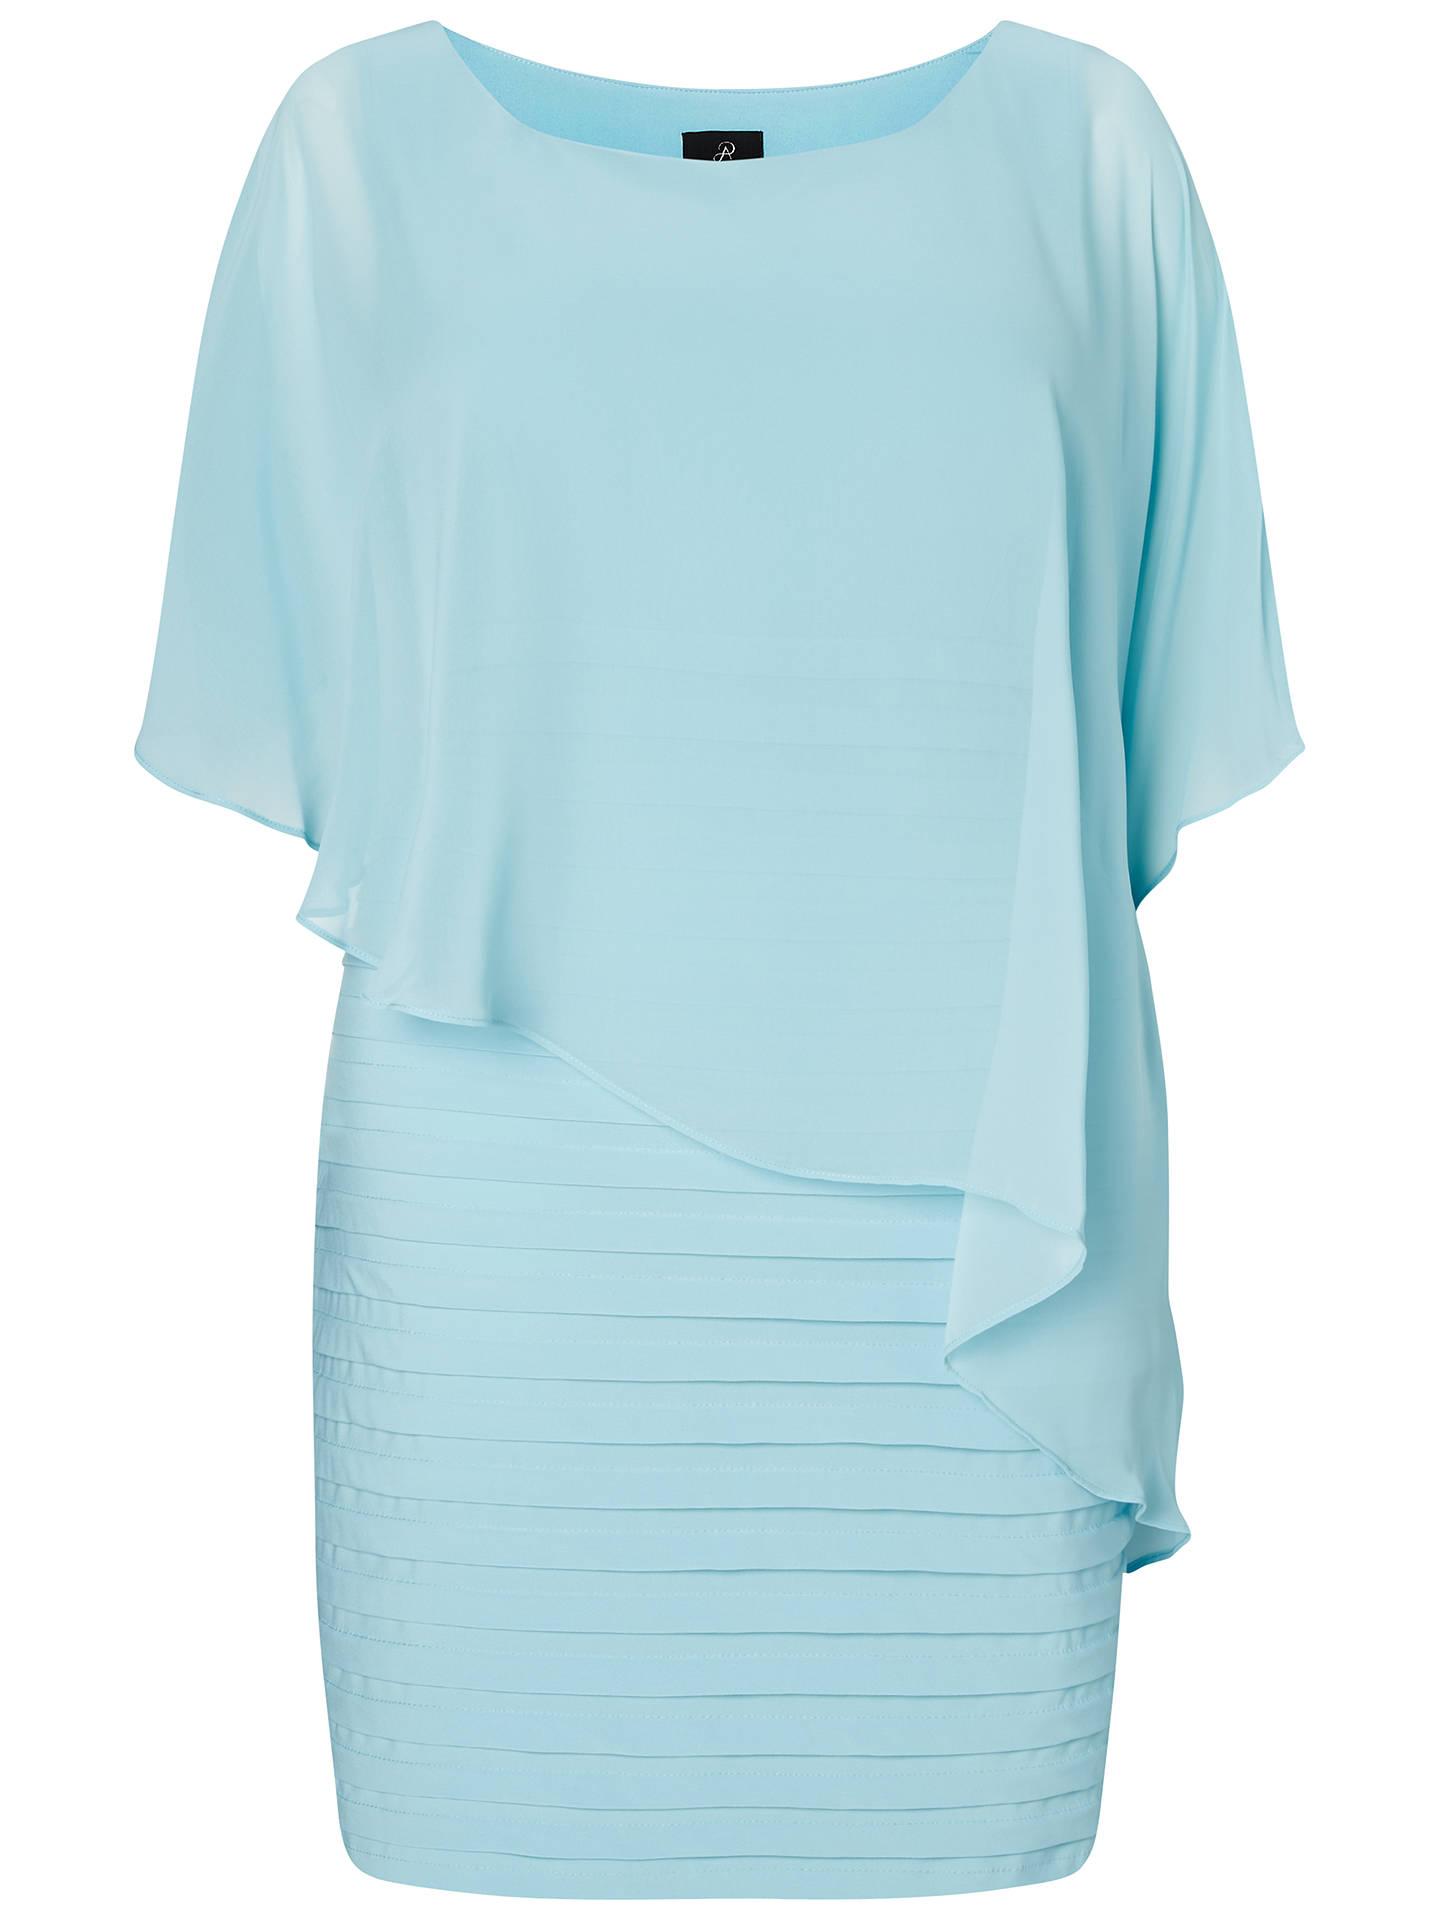 Adrianna Papell Women/'s Chiffon Drape Overlay With Banding Dress Black size uk 8